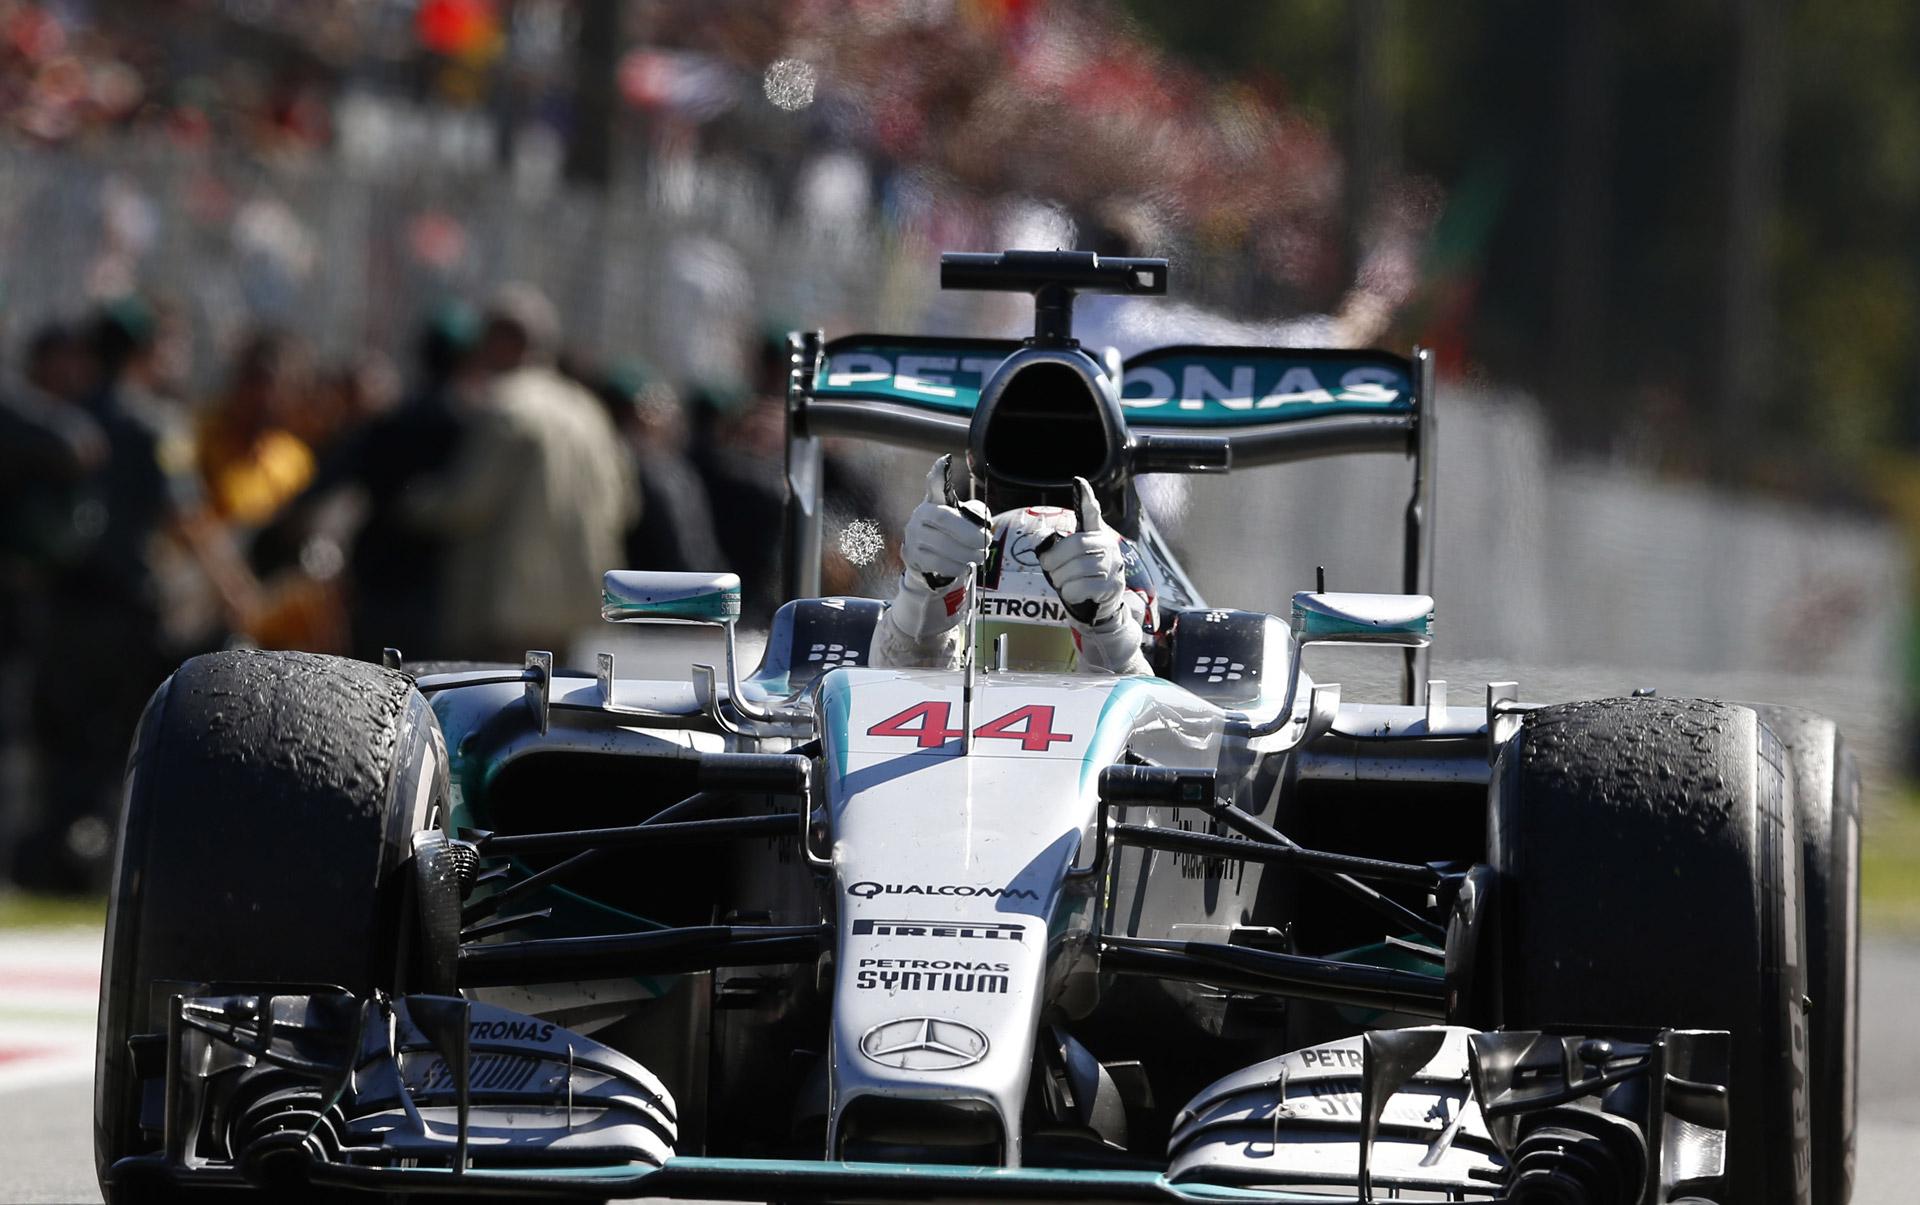 Hamilton Wins 2015 Formula One Italian Grand Prix Vettel Makes Podium